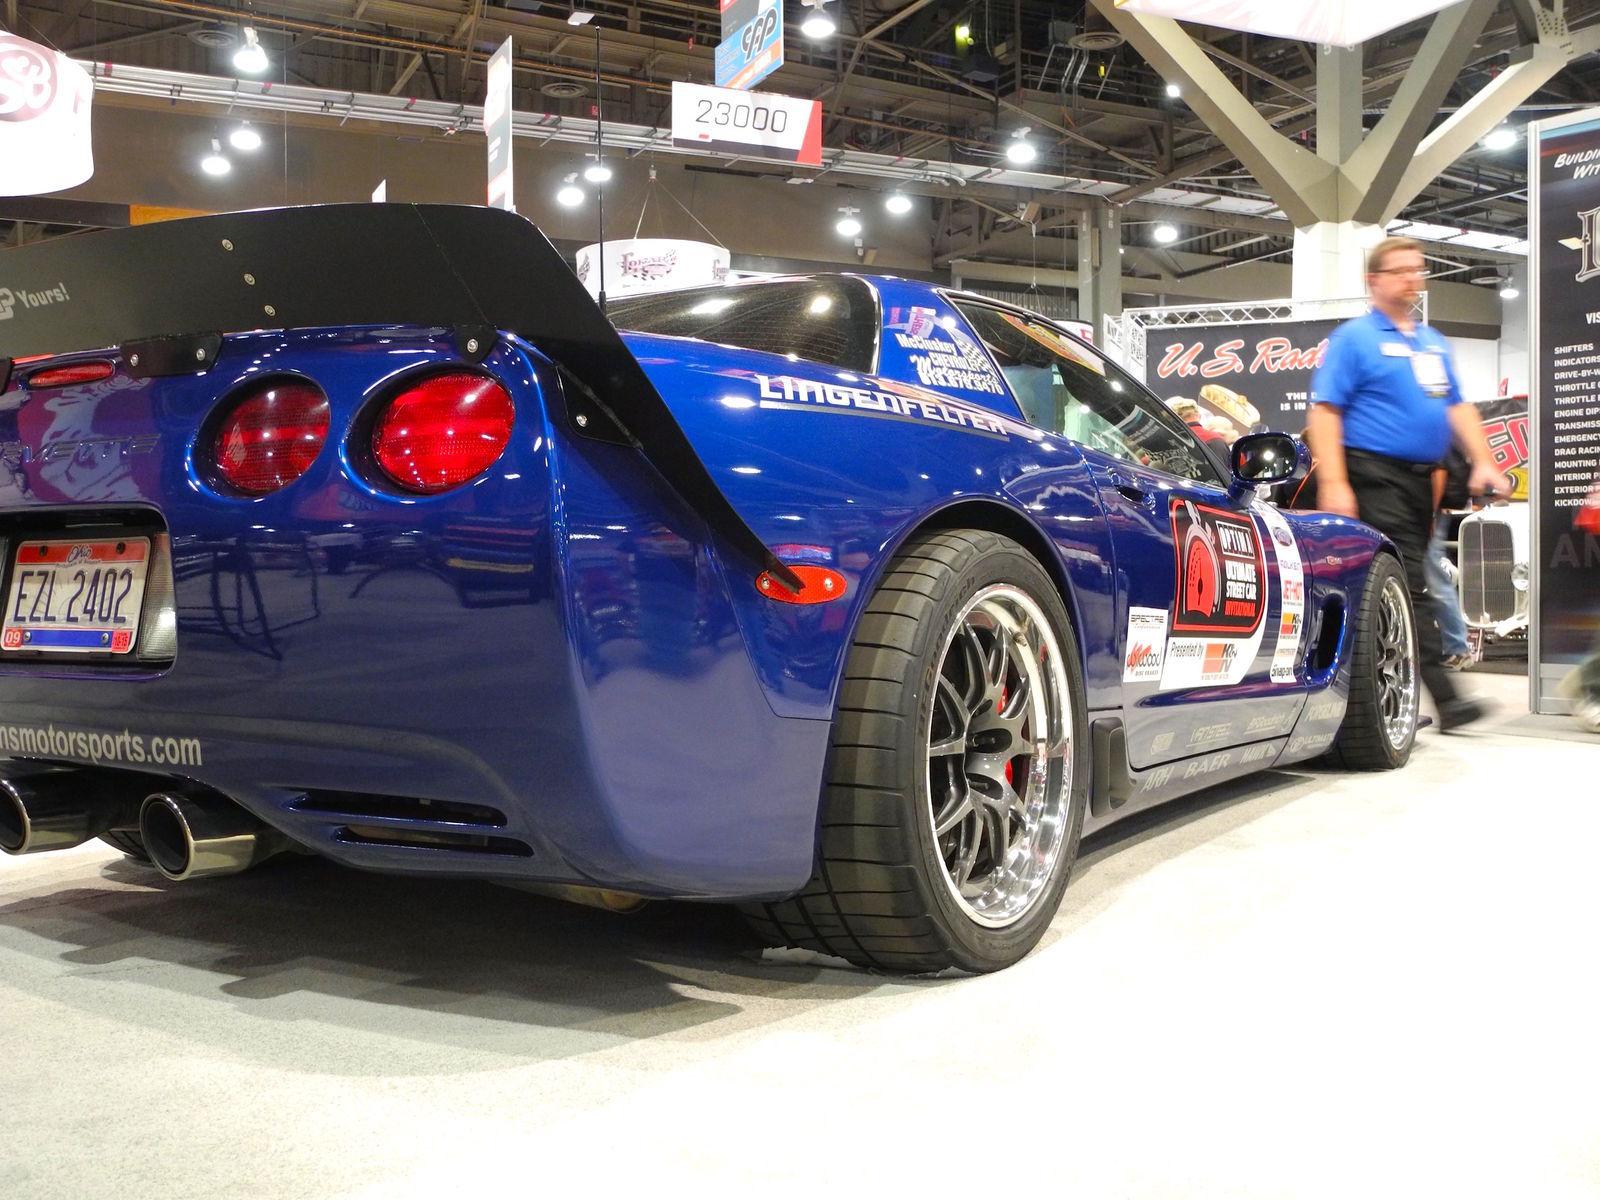 2003 Chevrolet Corvette Z06 | Danny Popp's RAFT Motorsports C5 Z06 on Forgeline GA3R Wheels - Angled Stance